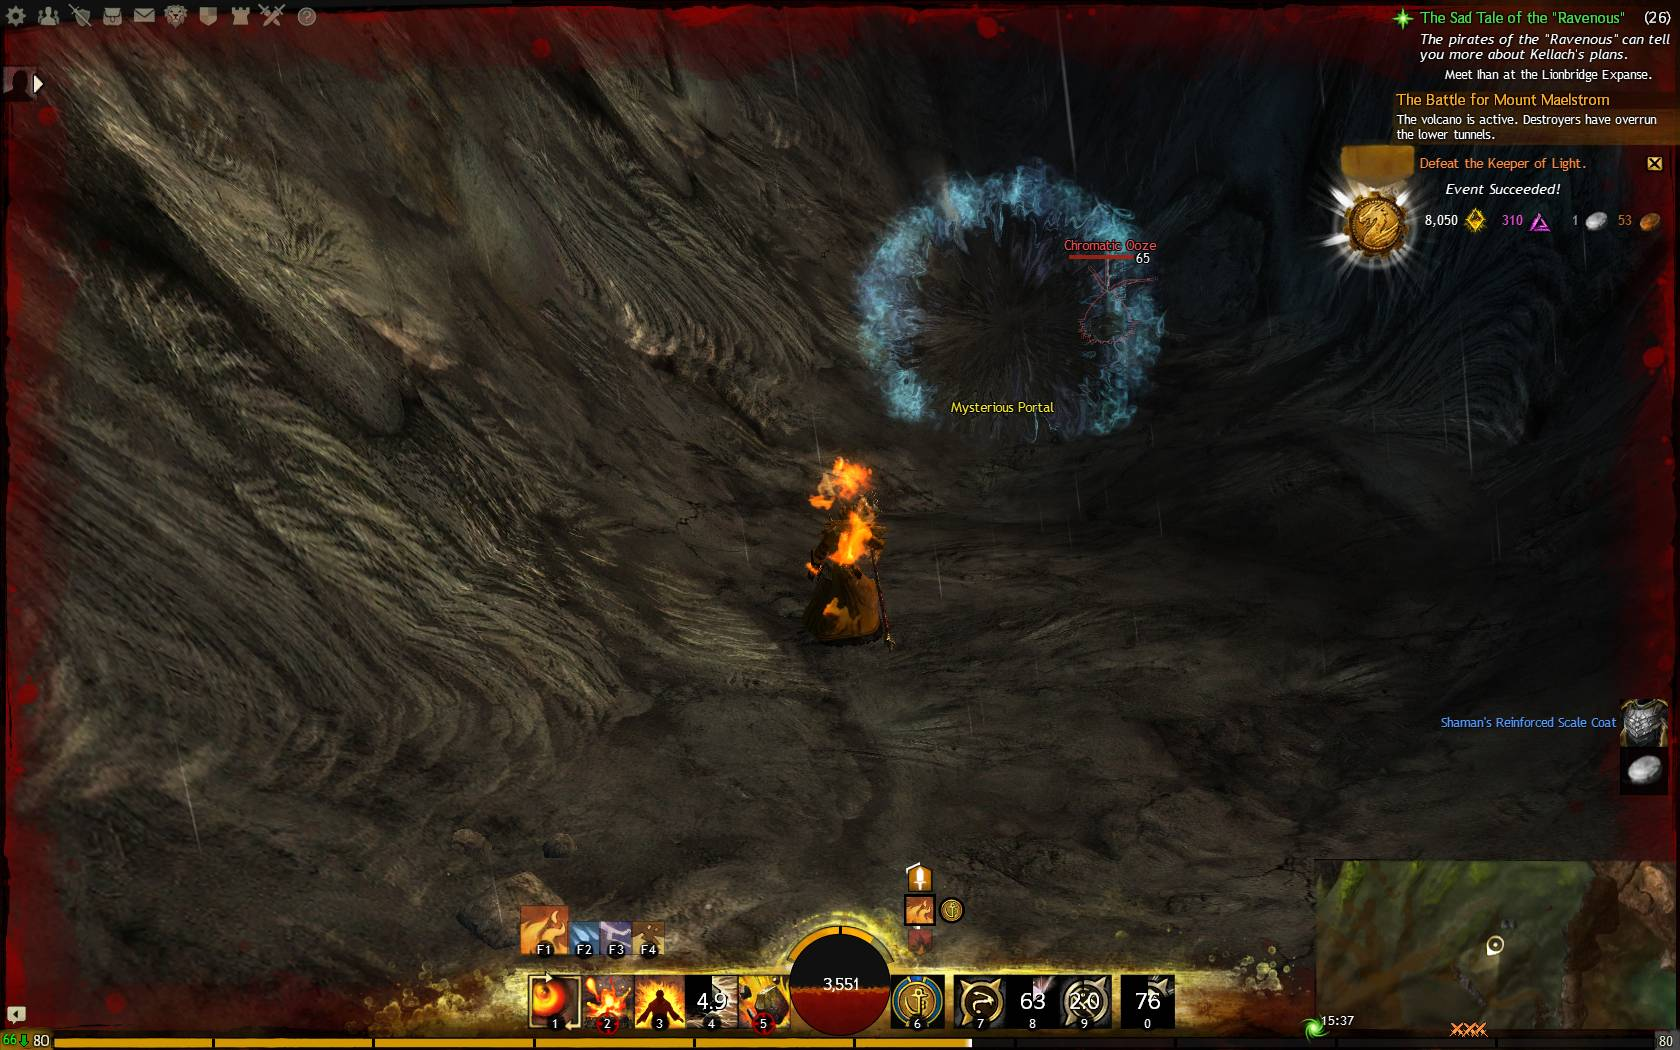 Hidden Garden Jumping Puzzle Keeper Of Light 4 Guild Wars 2 Life